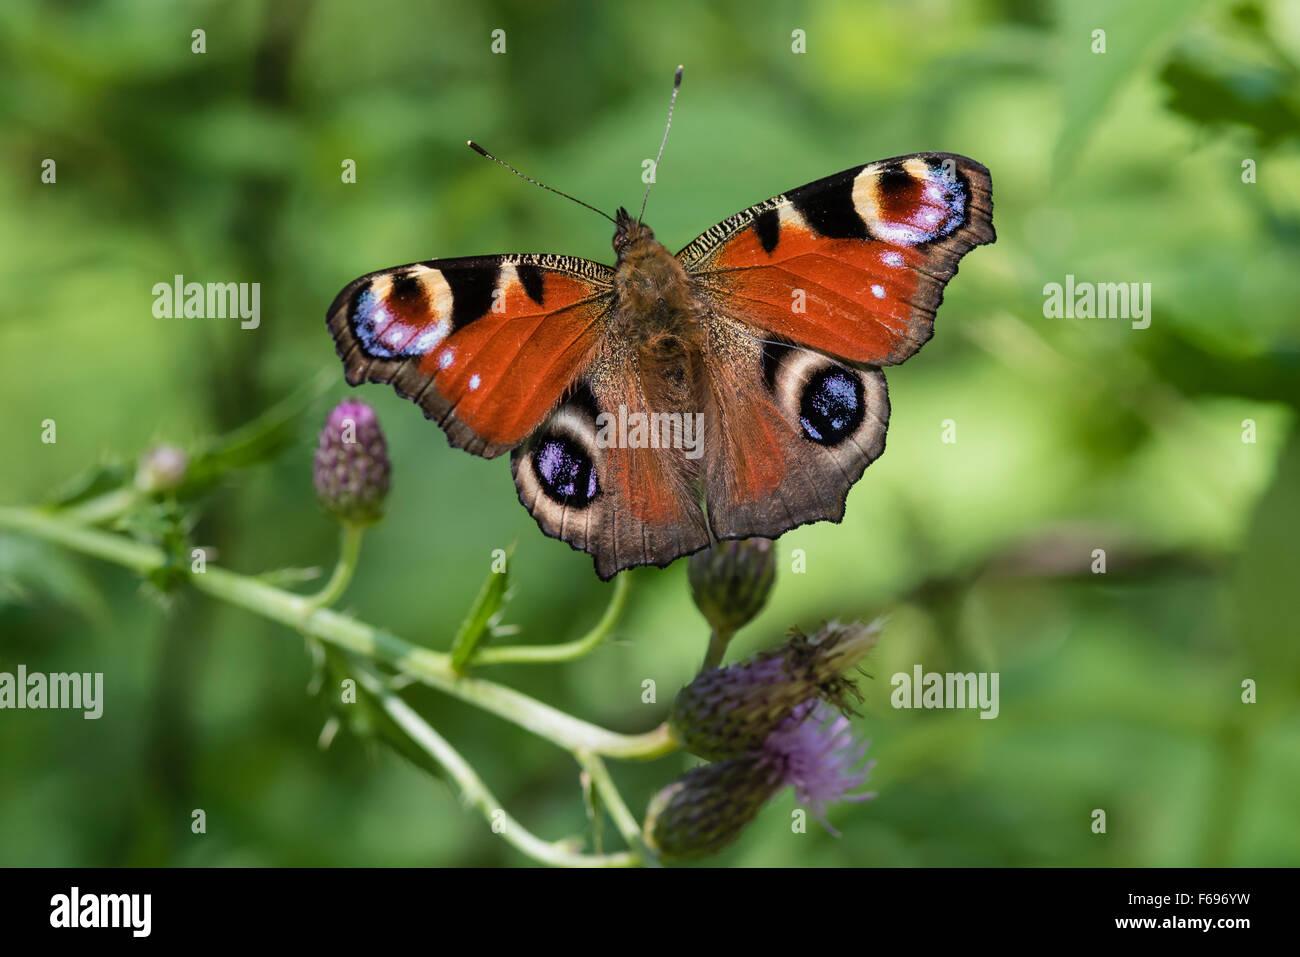 Aglais Tagpfauenauge, Io, Europa mariposa pavo real Imagen De Stock